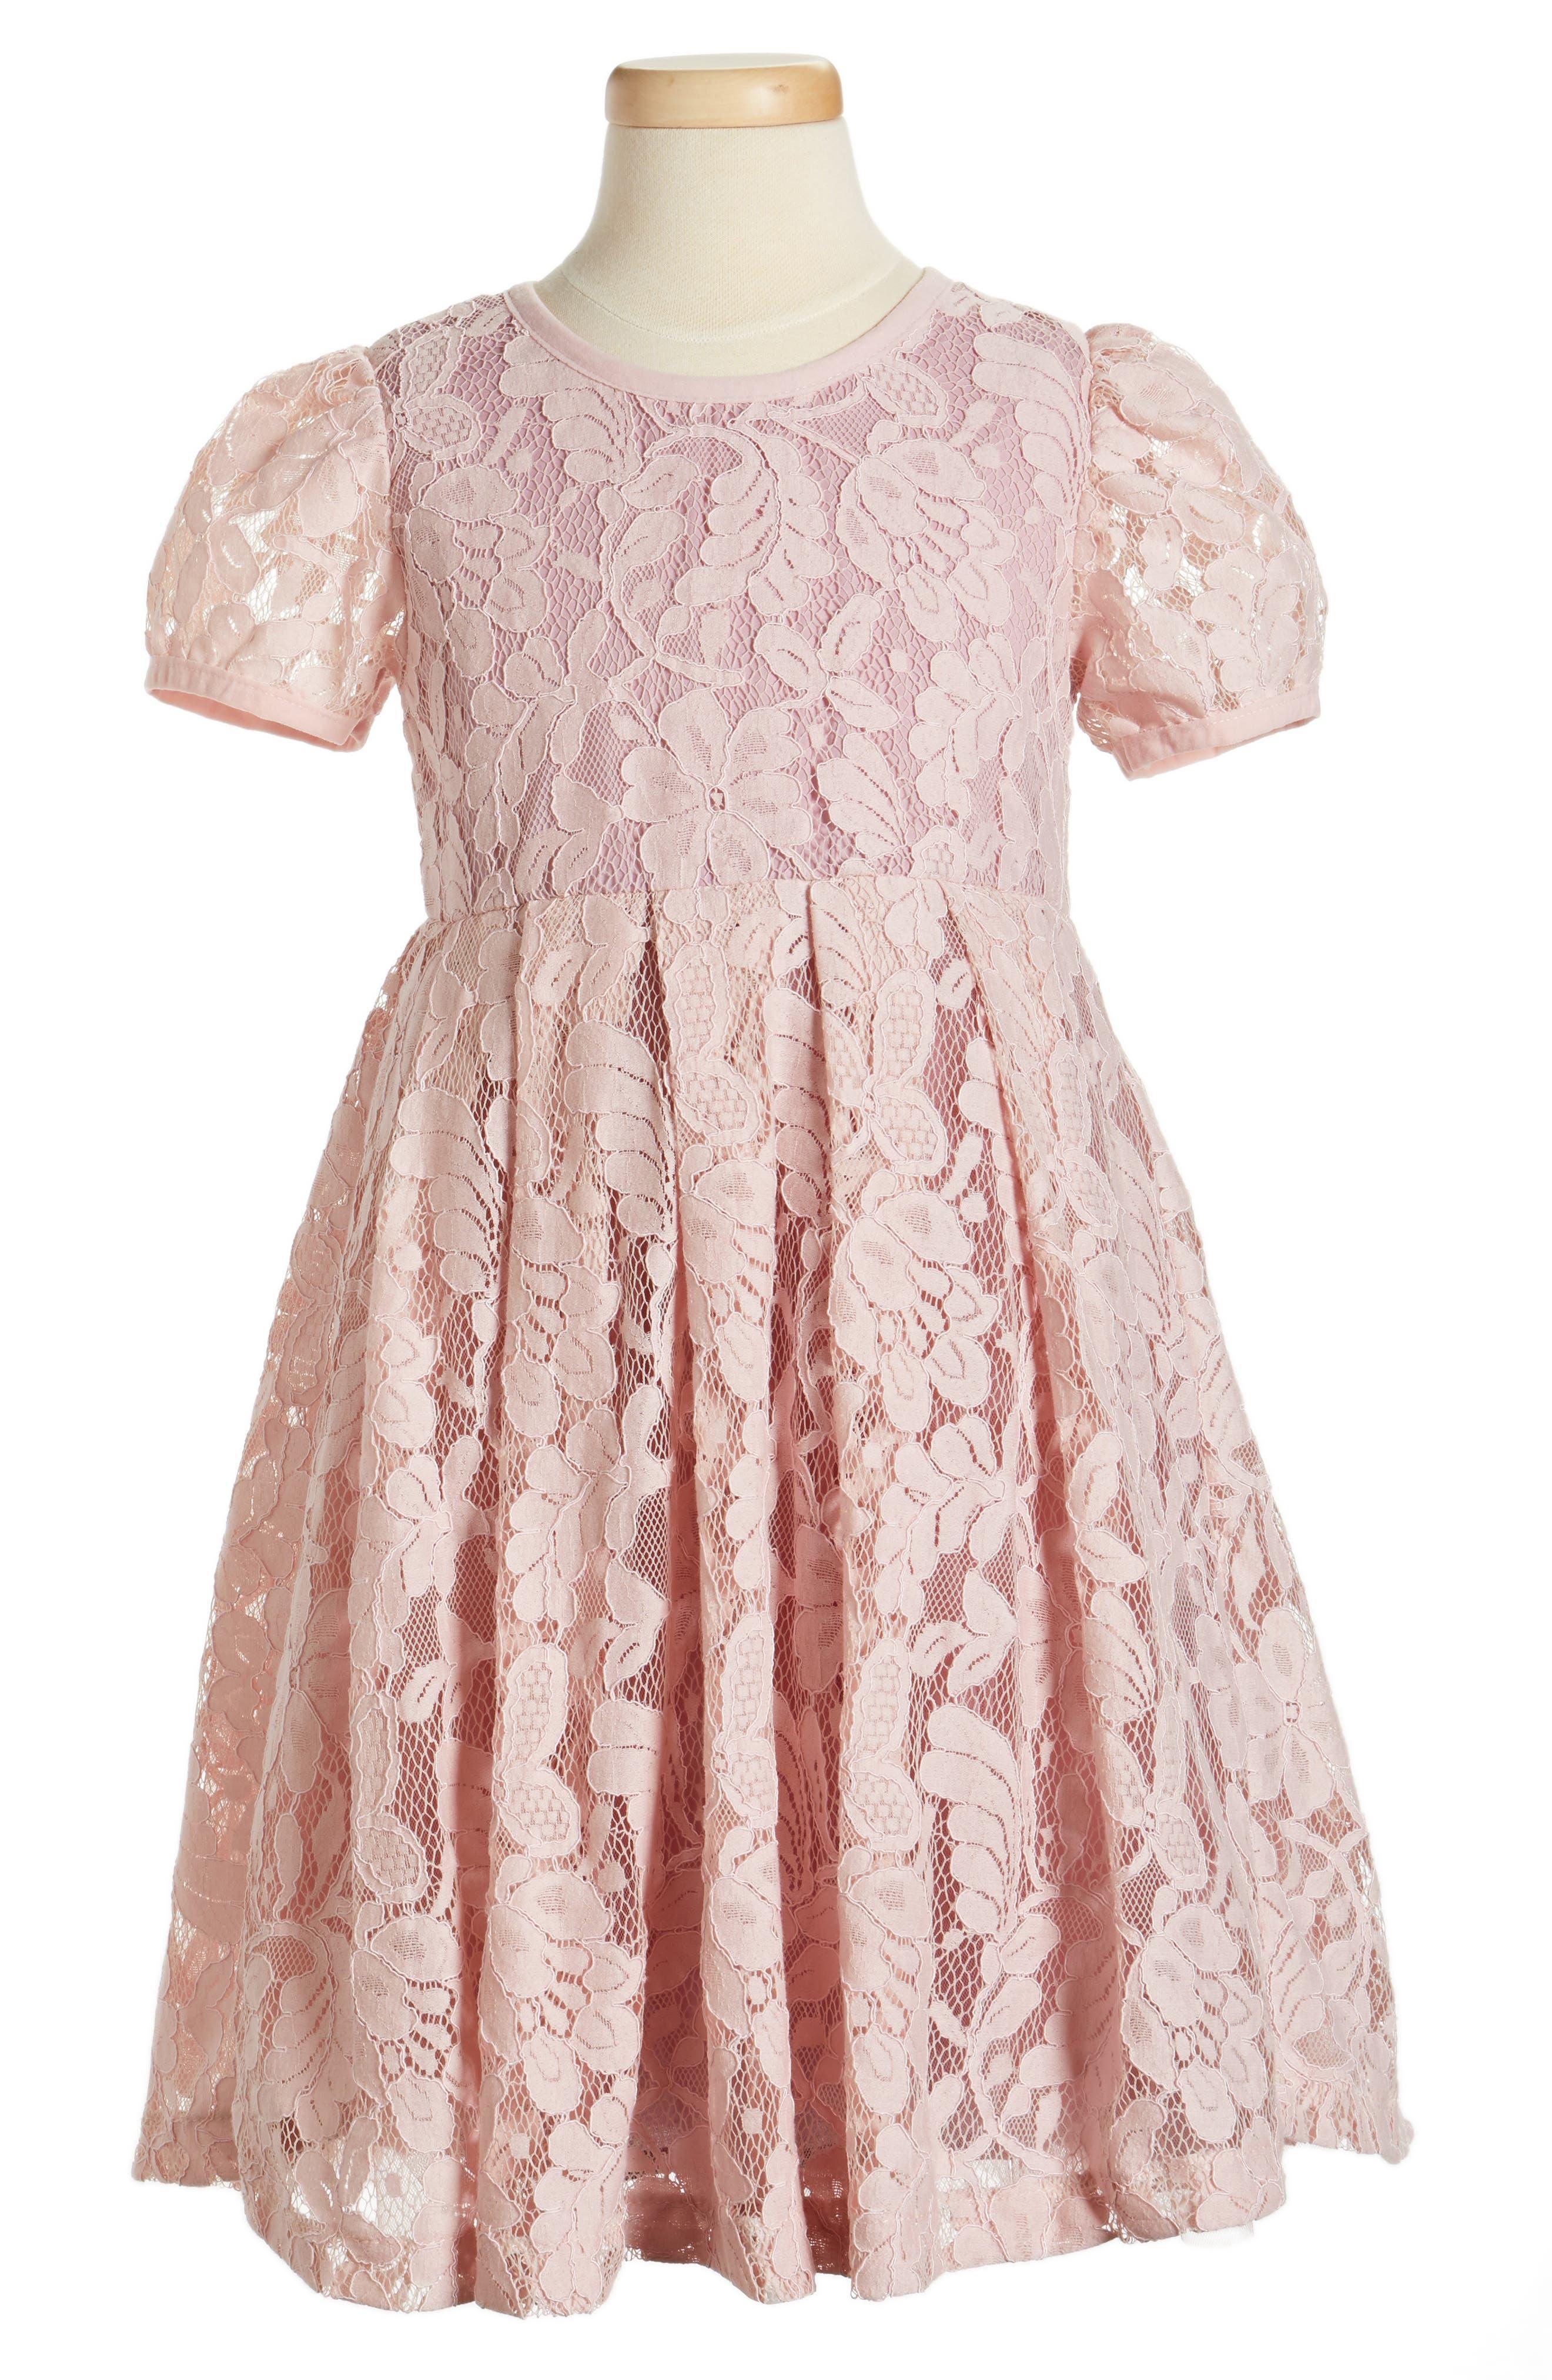 POPATU, Lace Dress, Main thumbnail 1, color, DUSTY PINK